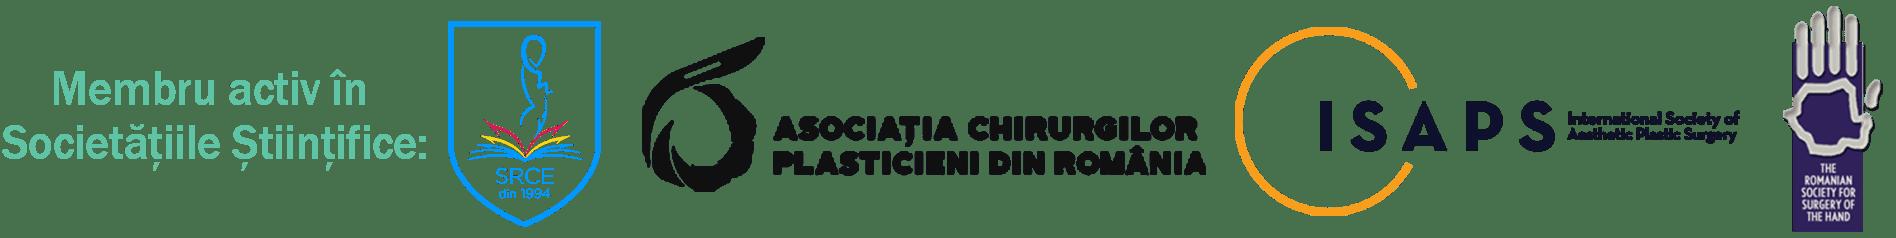 dr-maximilian-membru-societatiile